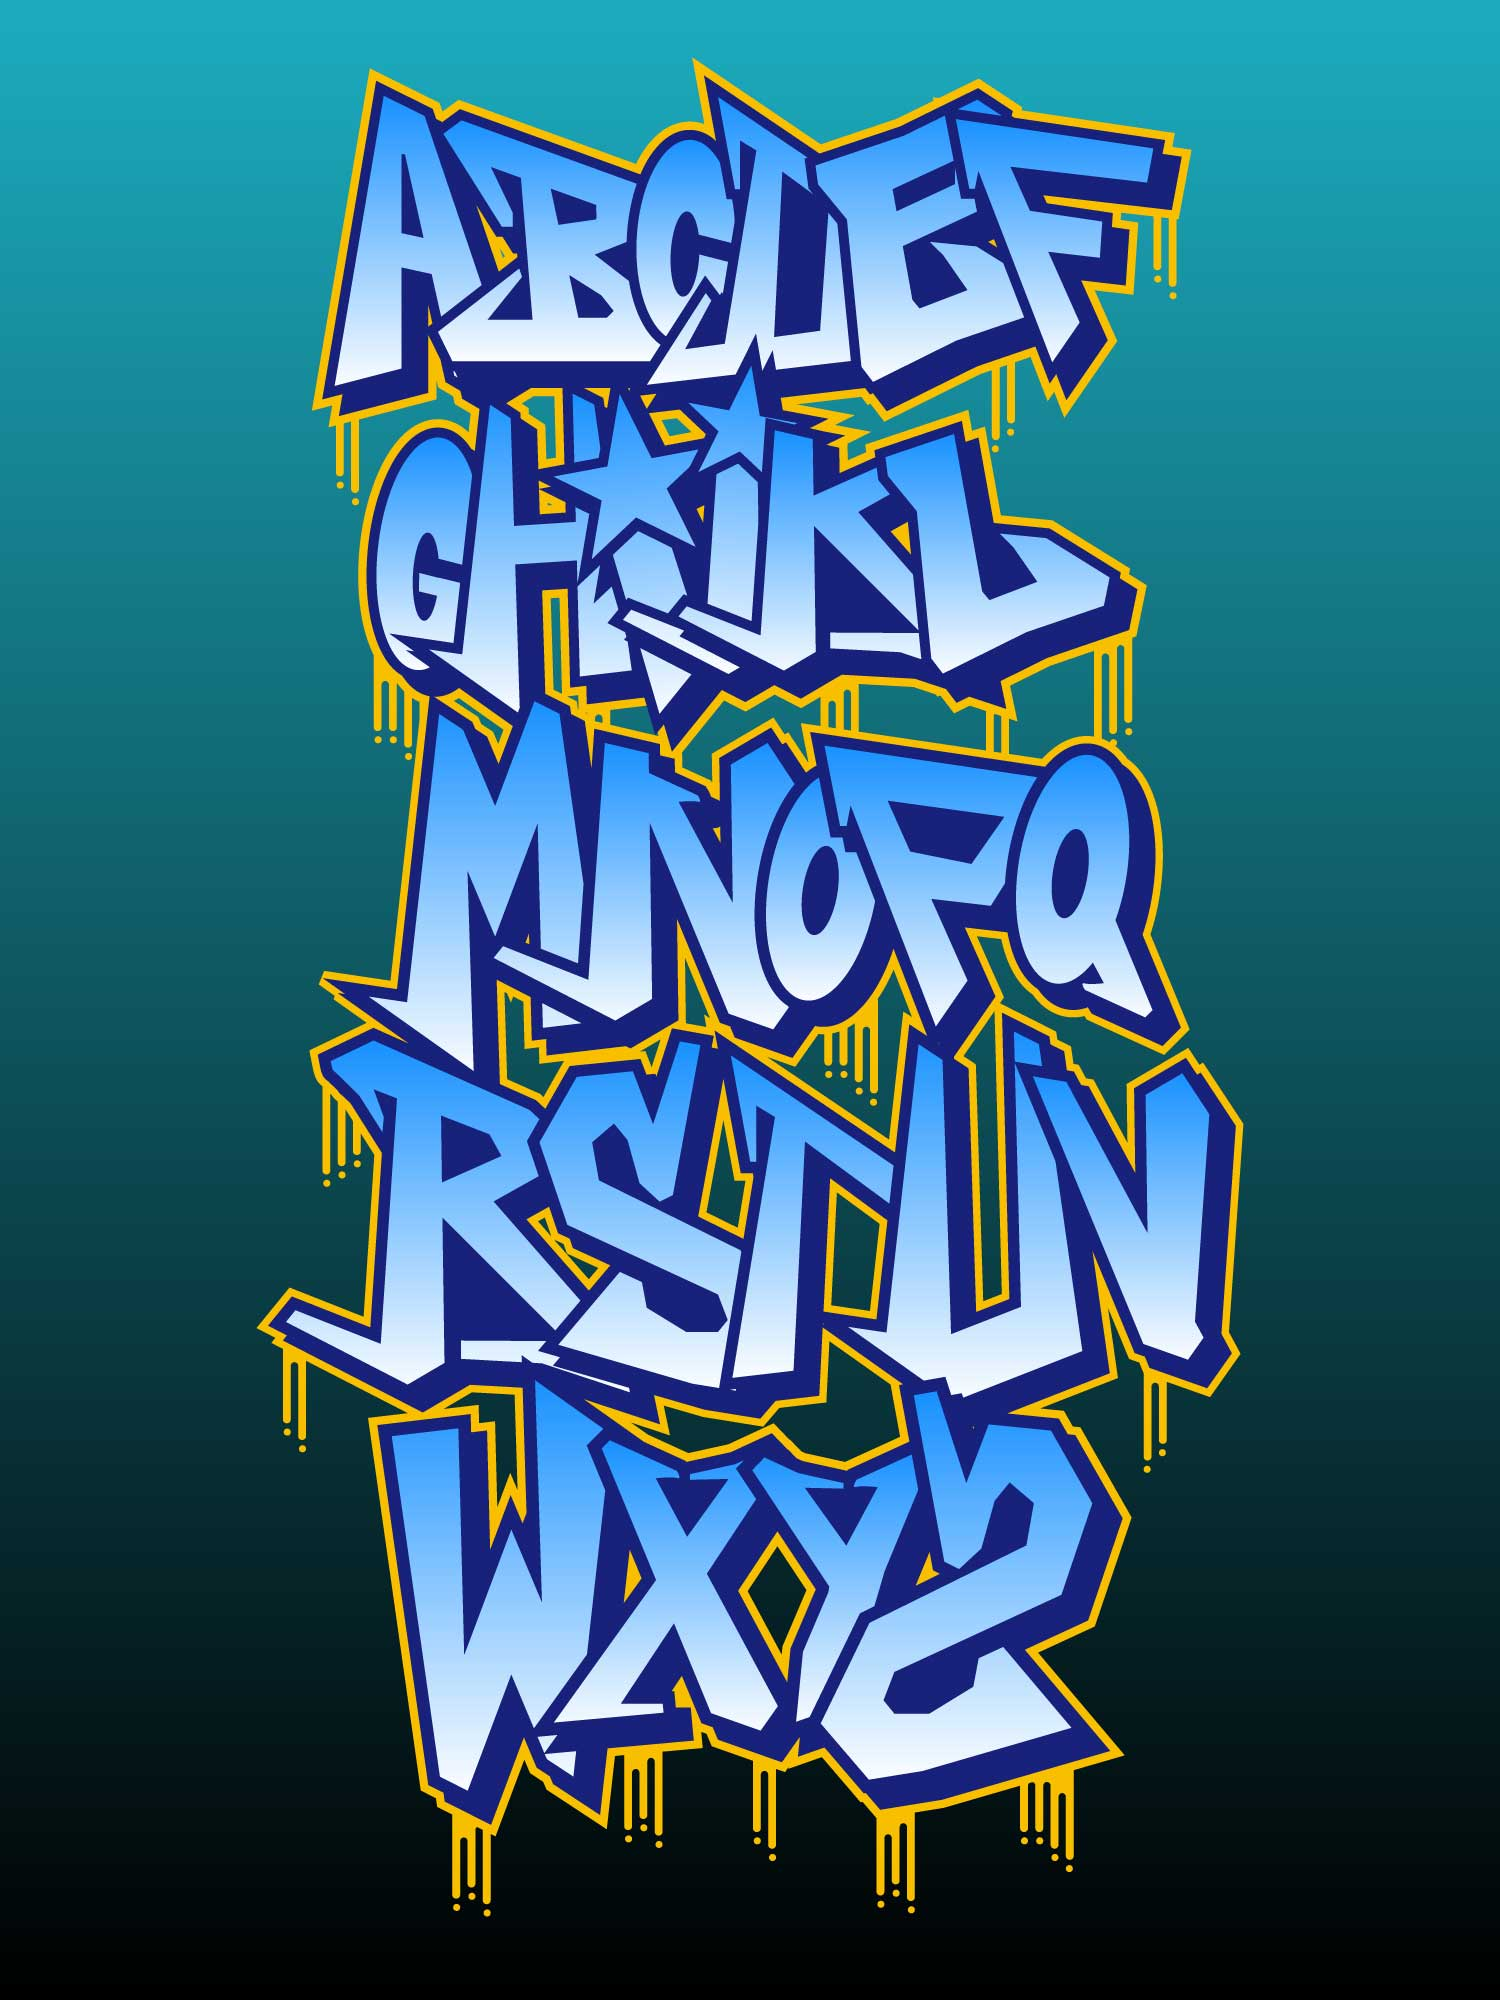 Beautiful graffiti alphabet vectors download free vector art stock graphics images